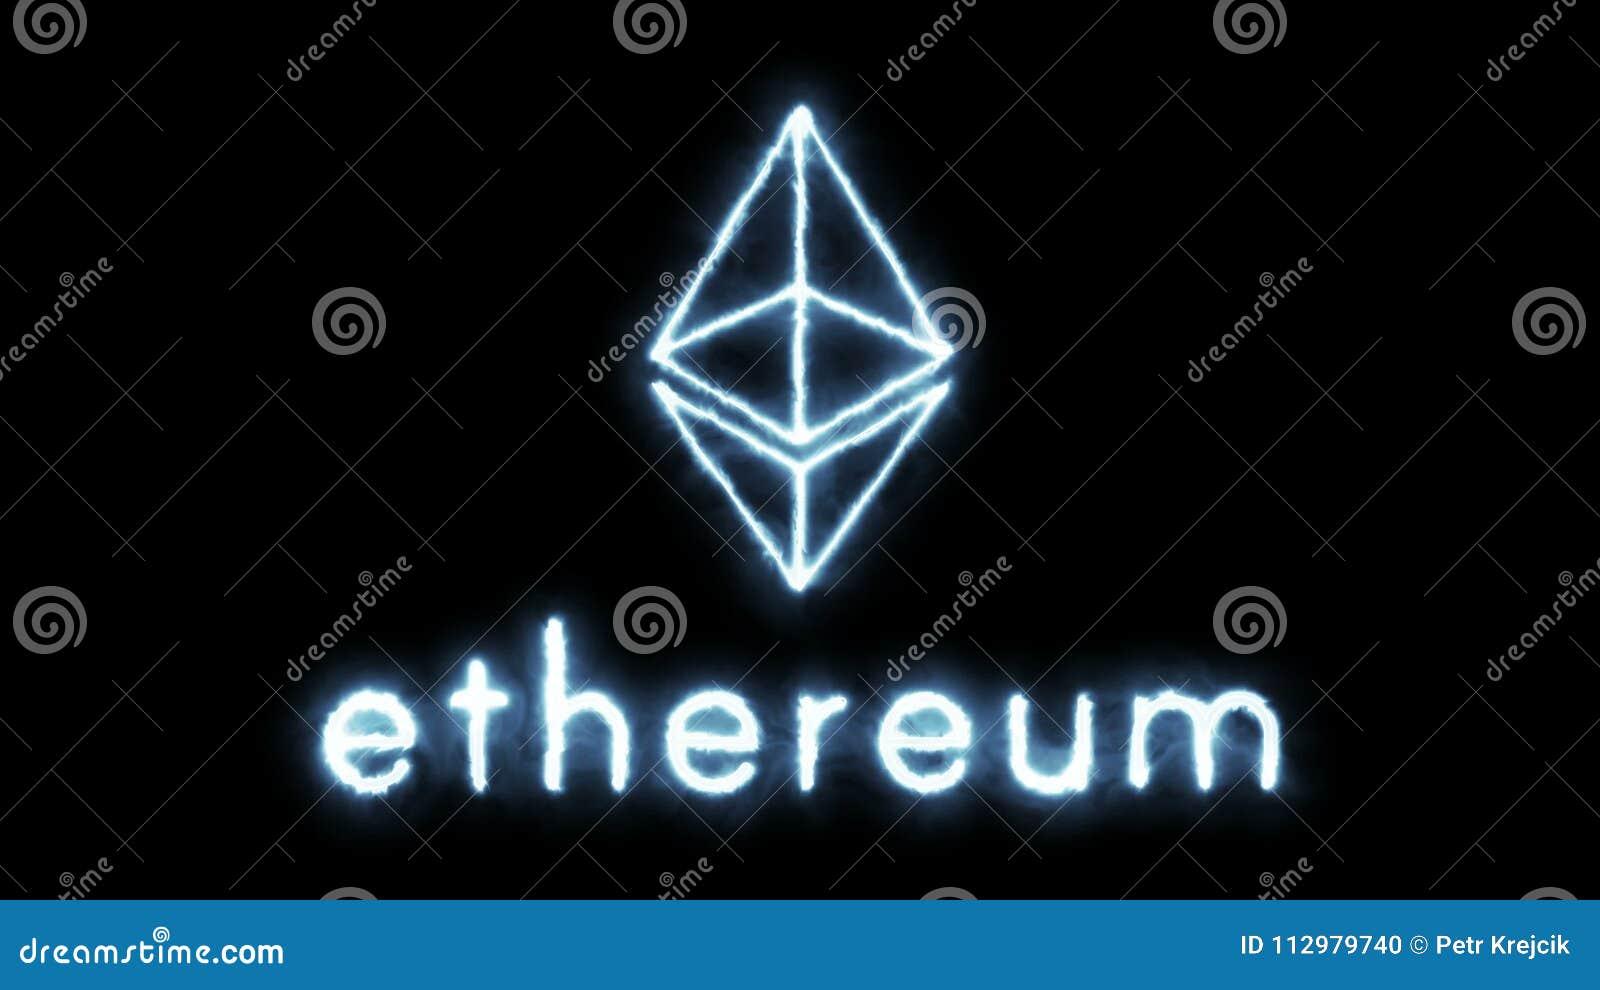 Ethereum Energy Logo